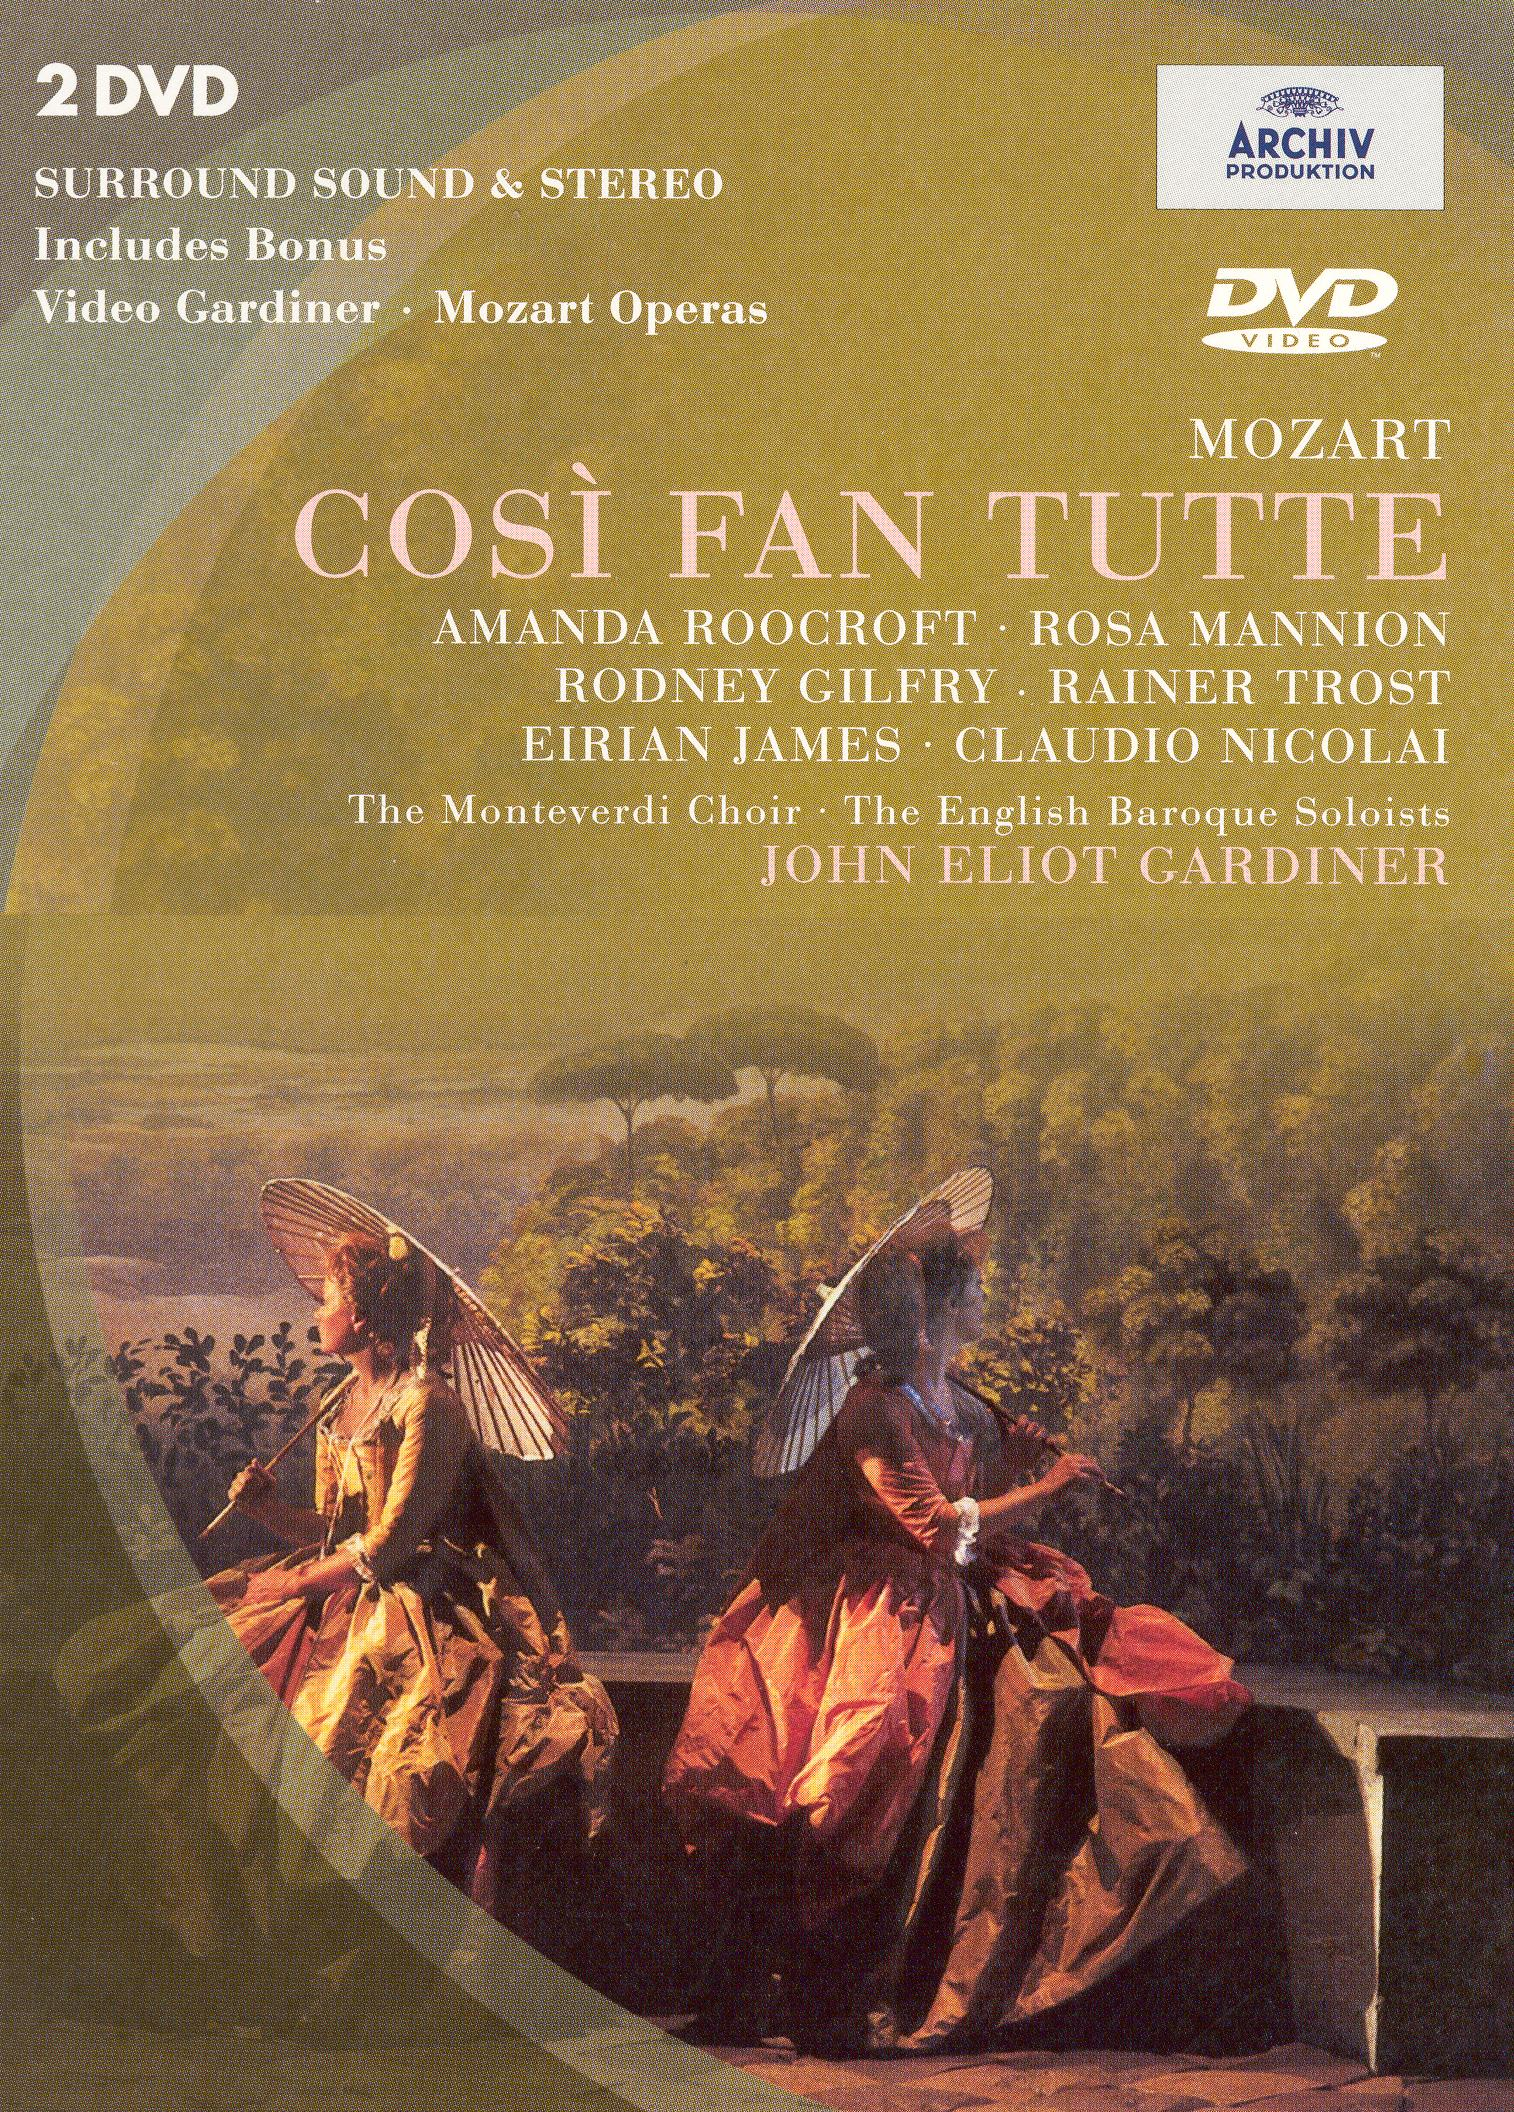 Cosi Fan Tutte (Theatre du Chatelet)